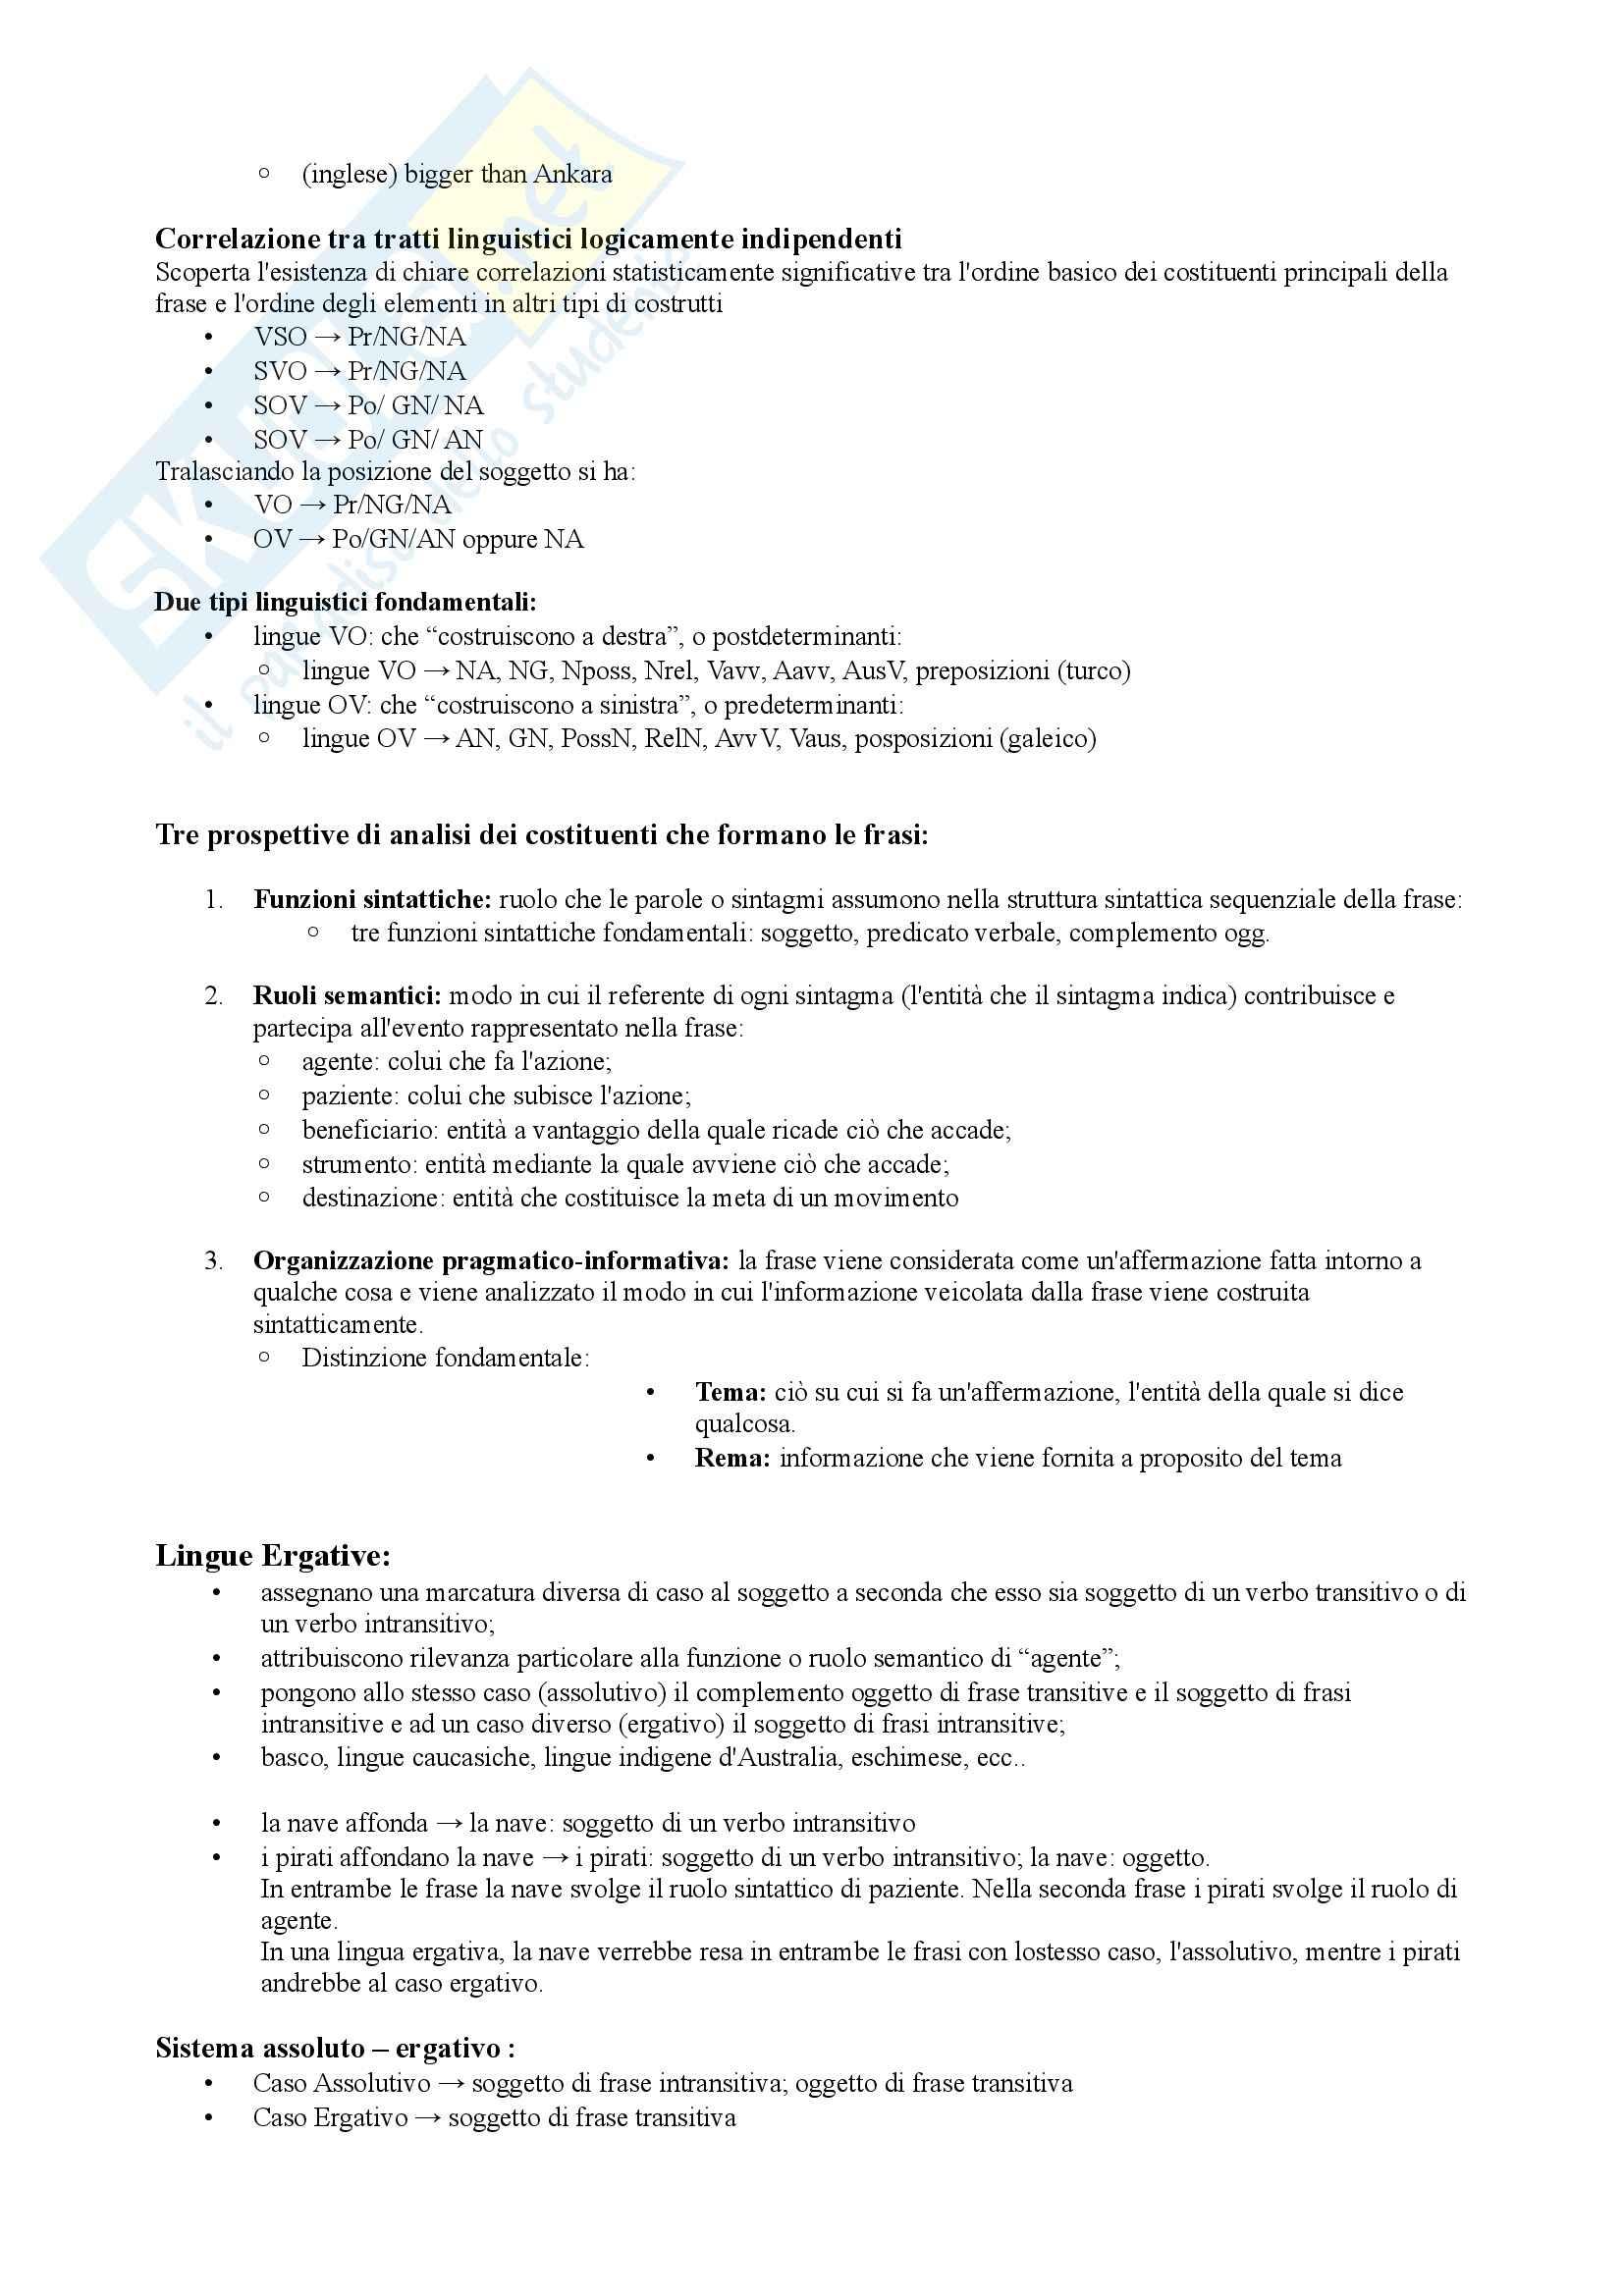 Glottologia - Appunti Pag. 11